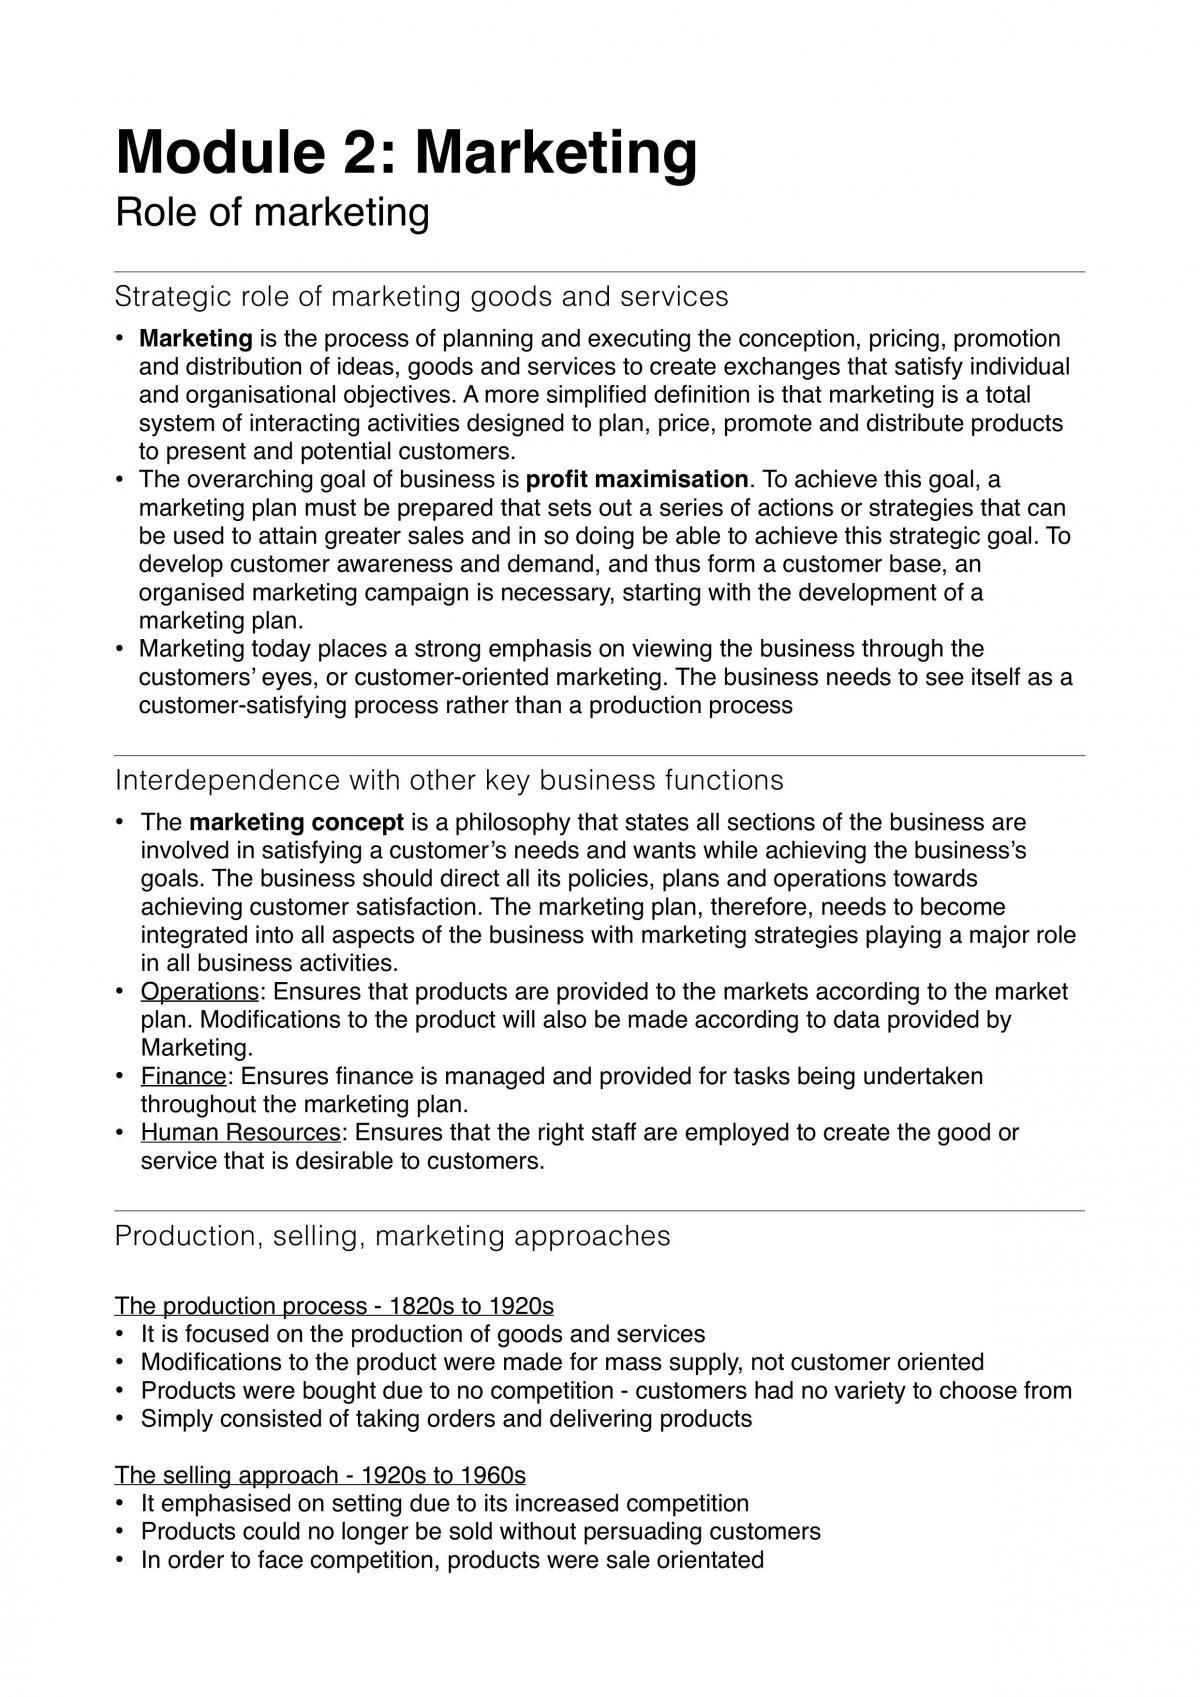 HSC Business Studies Module 2 Marketing notes - Page 1